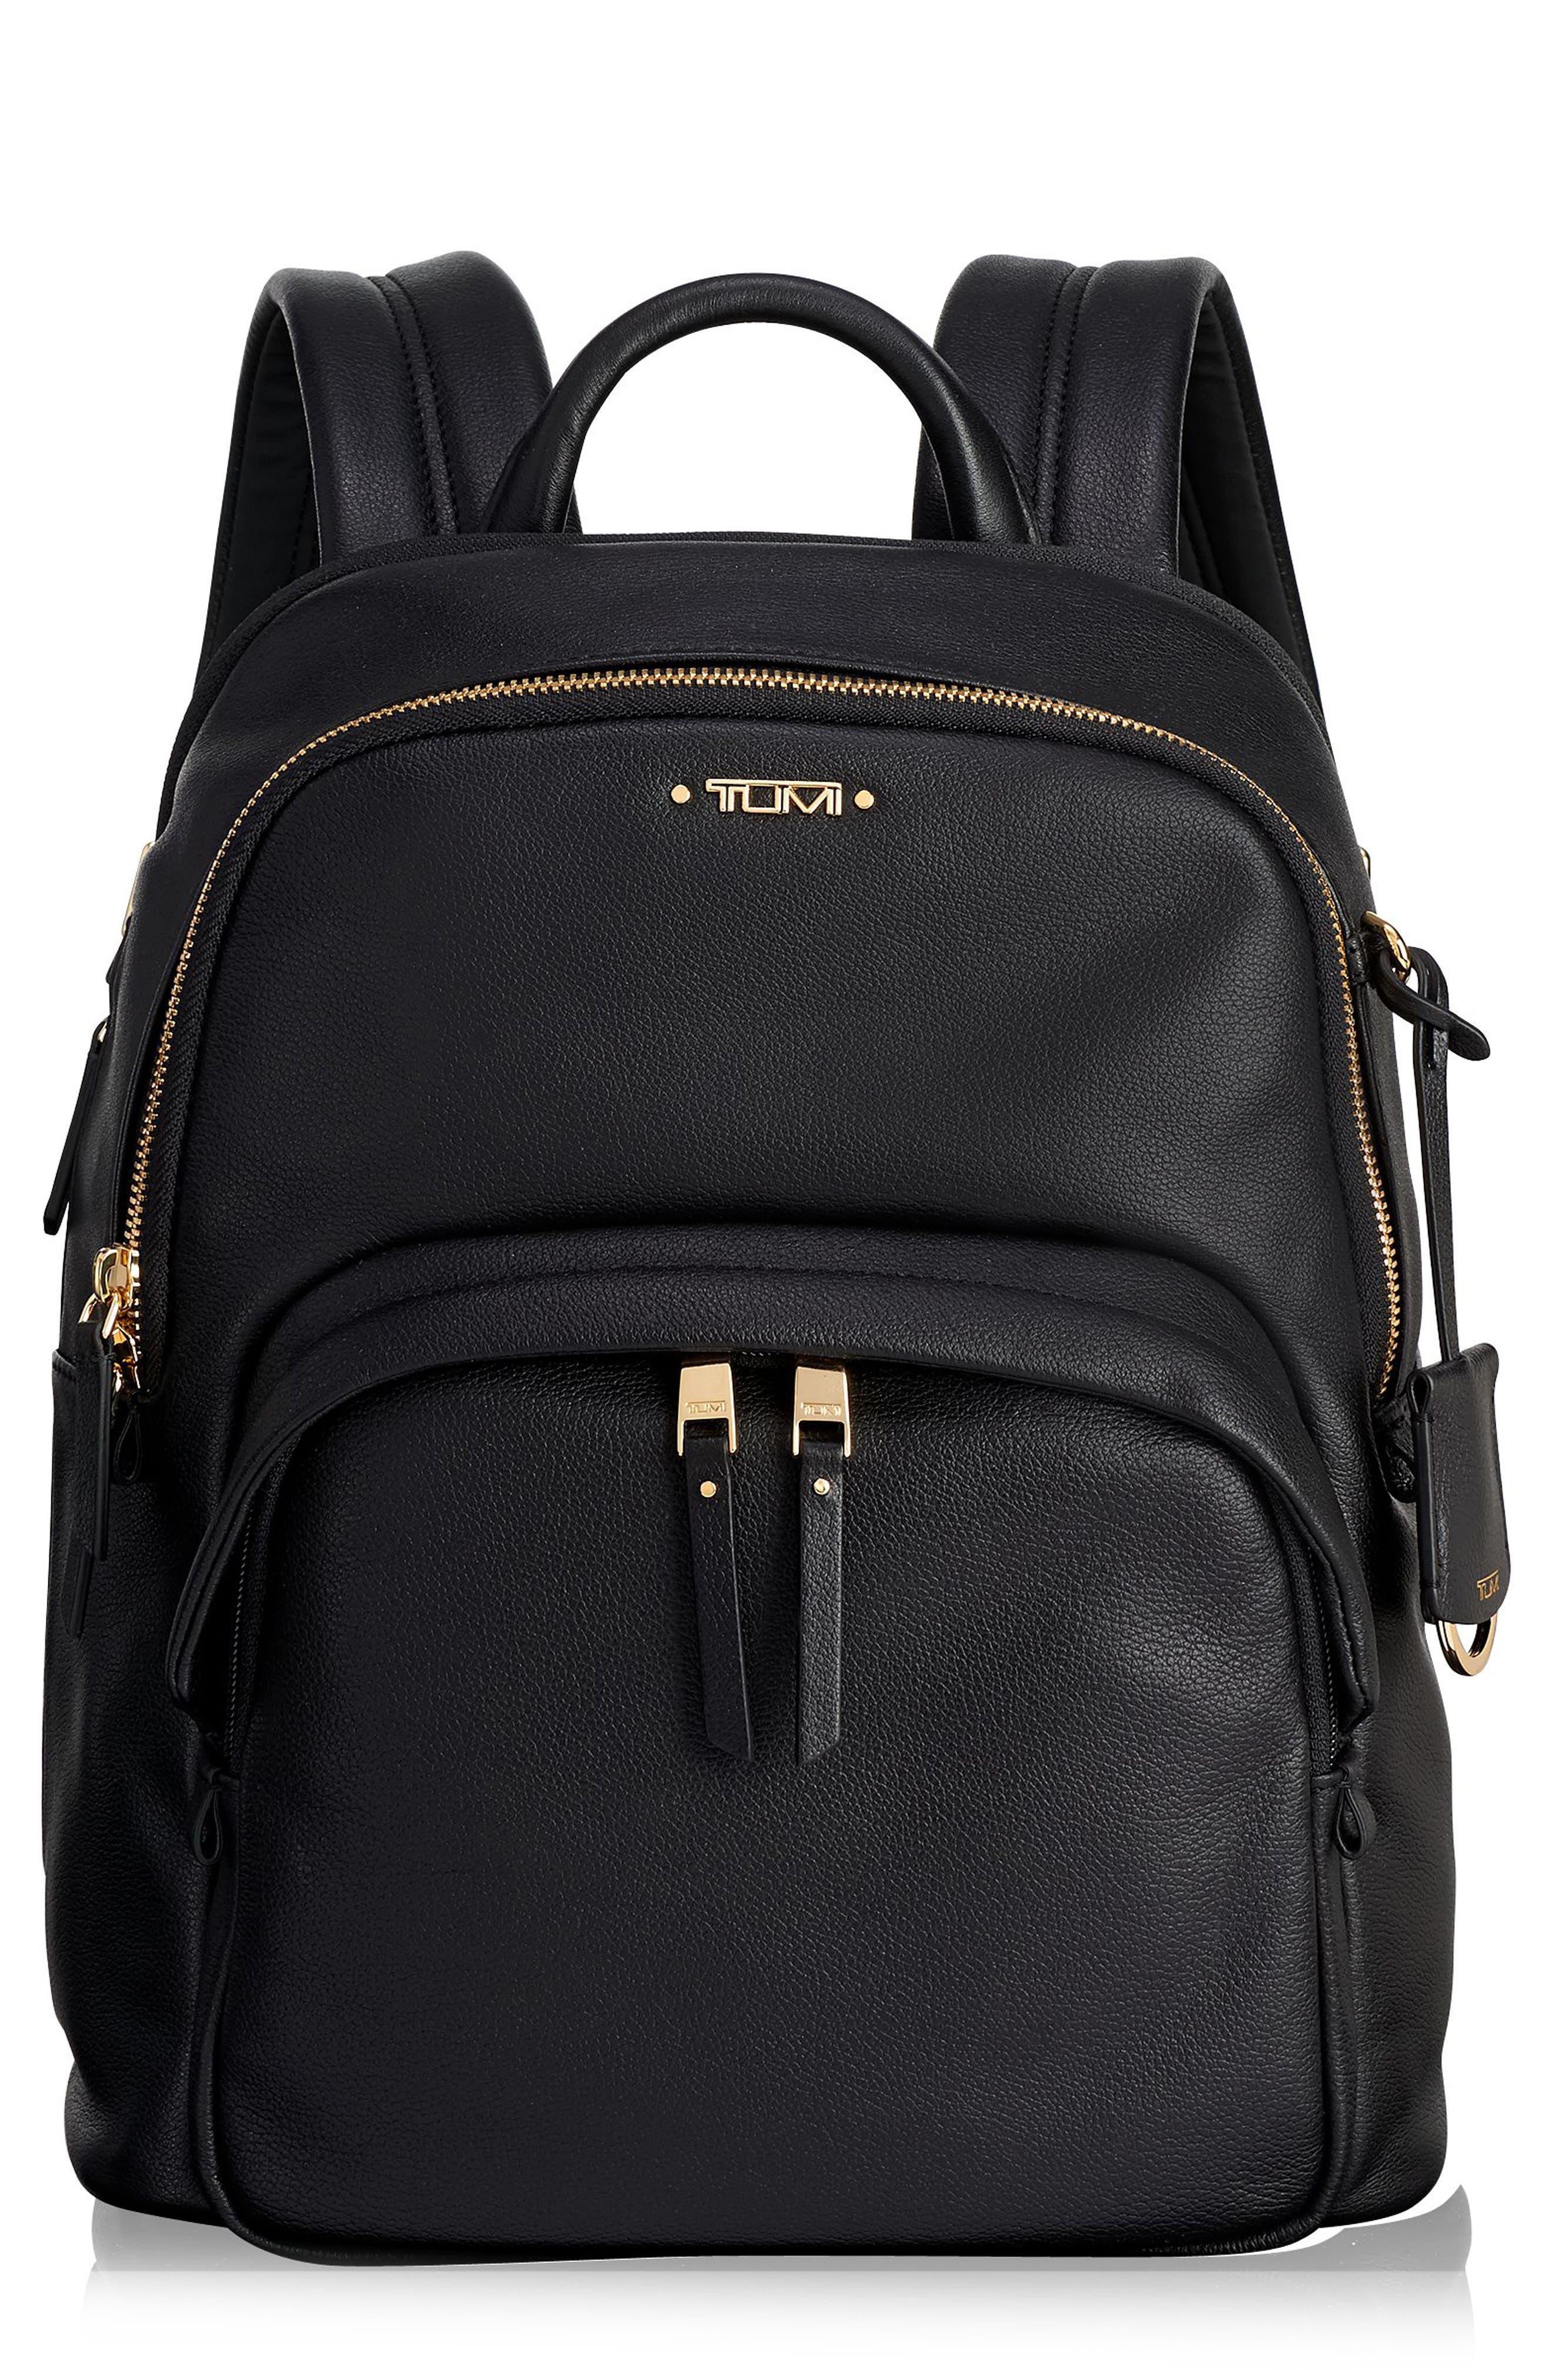 Voyageur - Dori Leather Backpack,                             Main thumbnail 1, color,                             BLACK